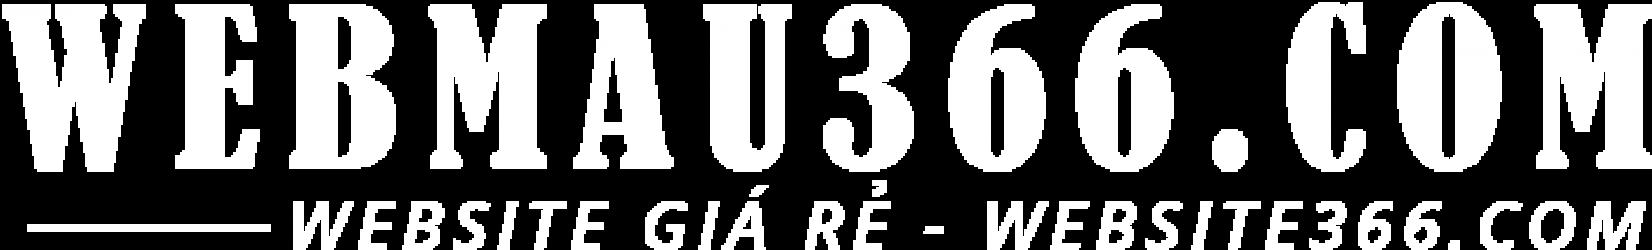 Mẫu web nội thất 01 – Thiết kế website 366